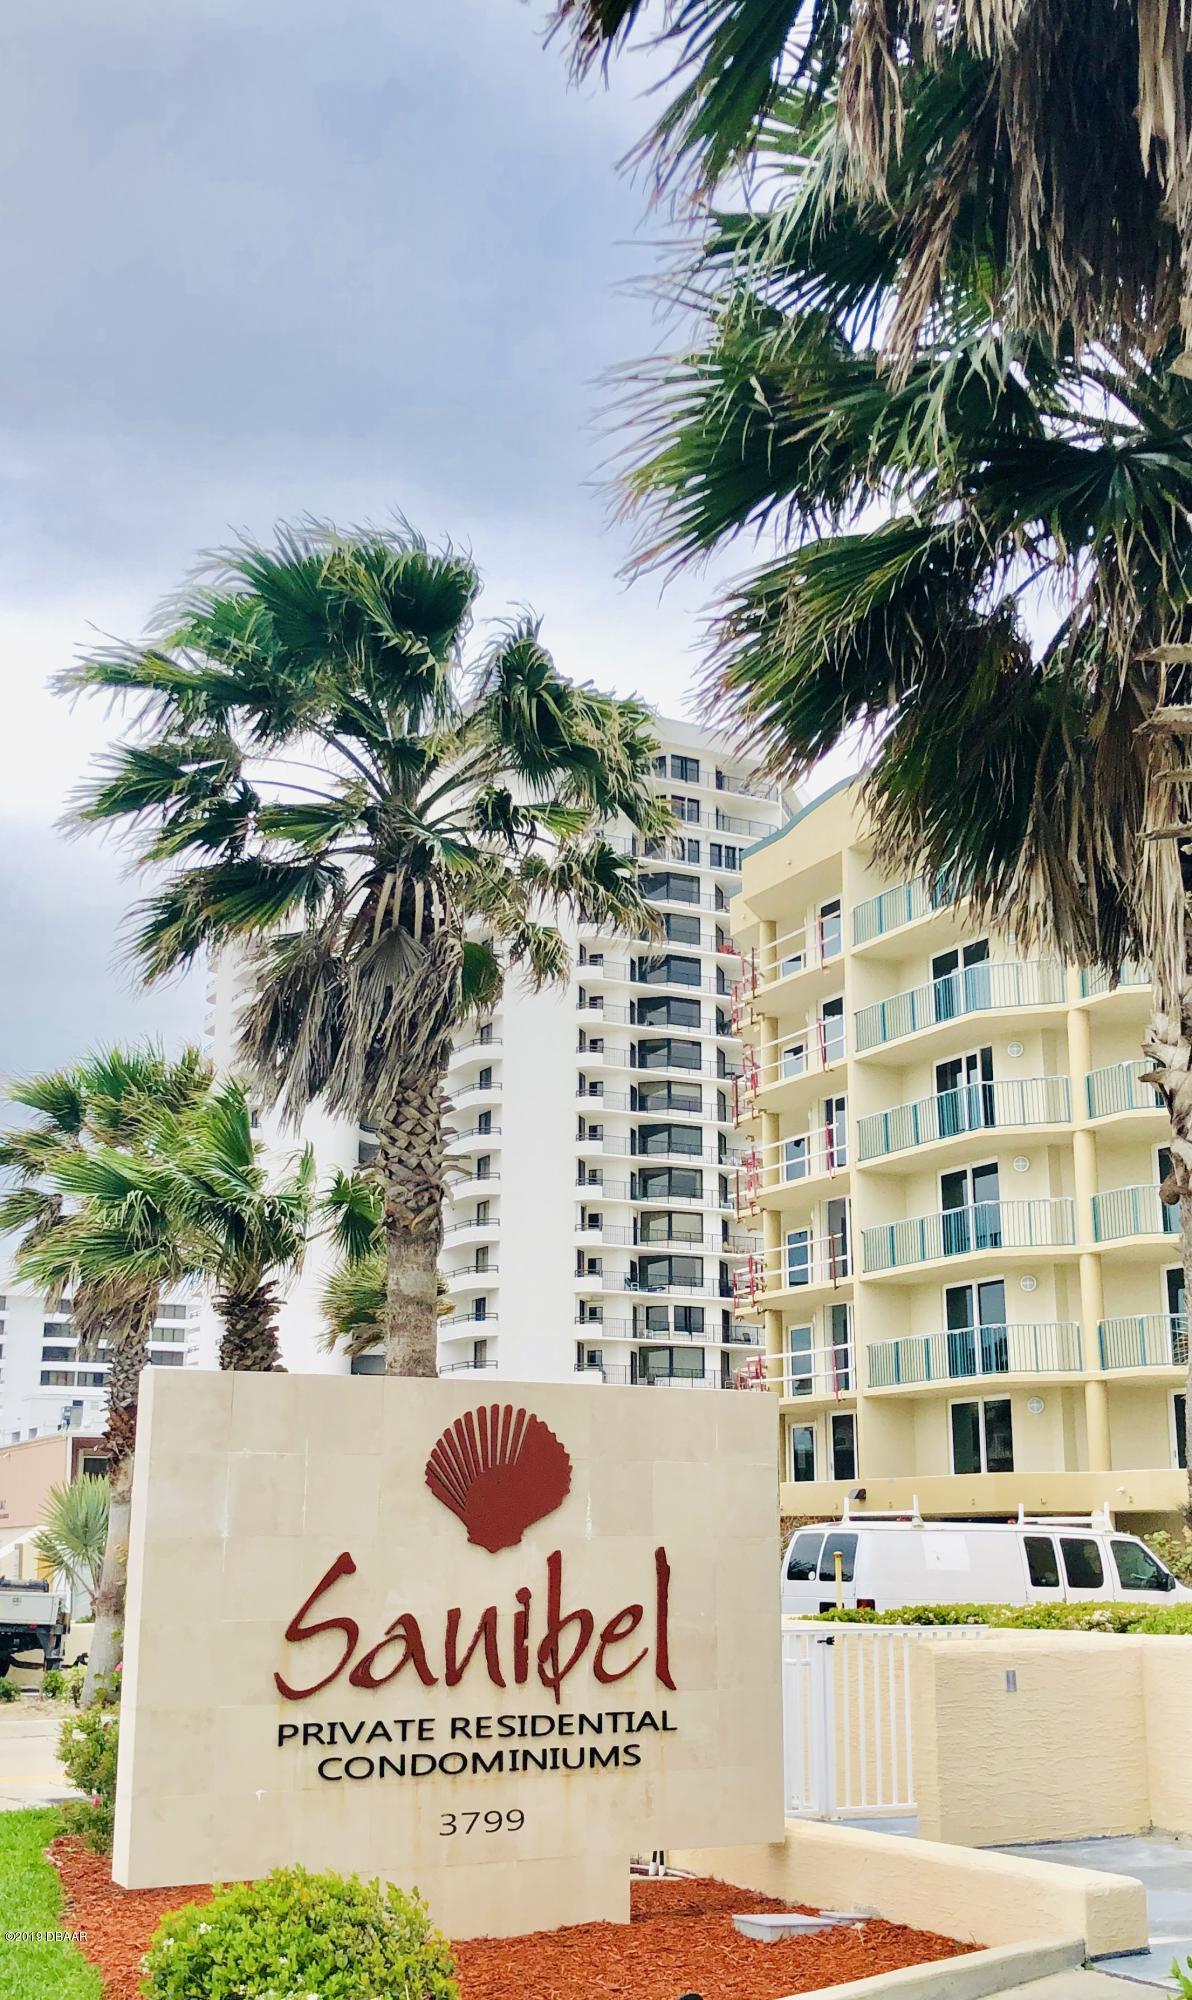 3799 S Atlantic Avenue 32118 - One of Daytona Beach Shores Homes for Sale